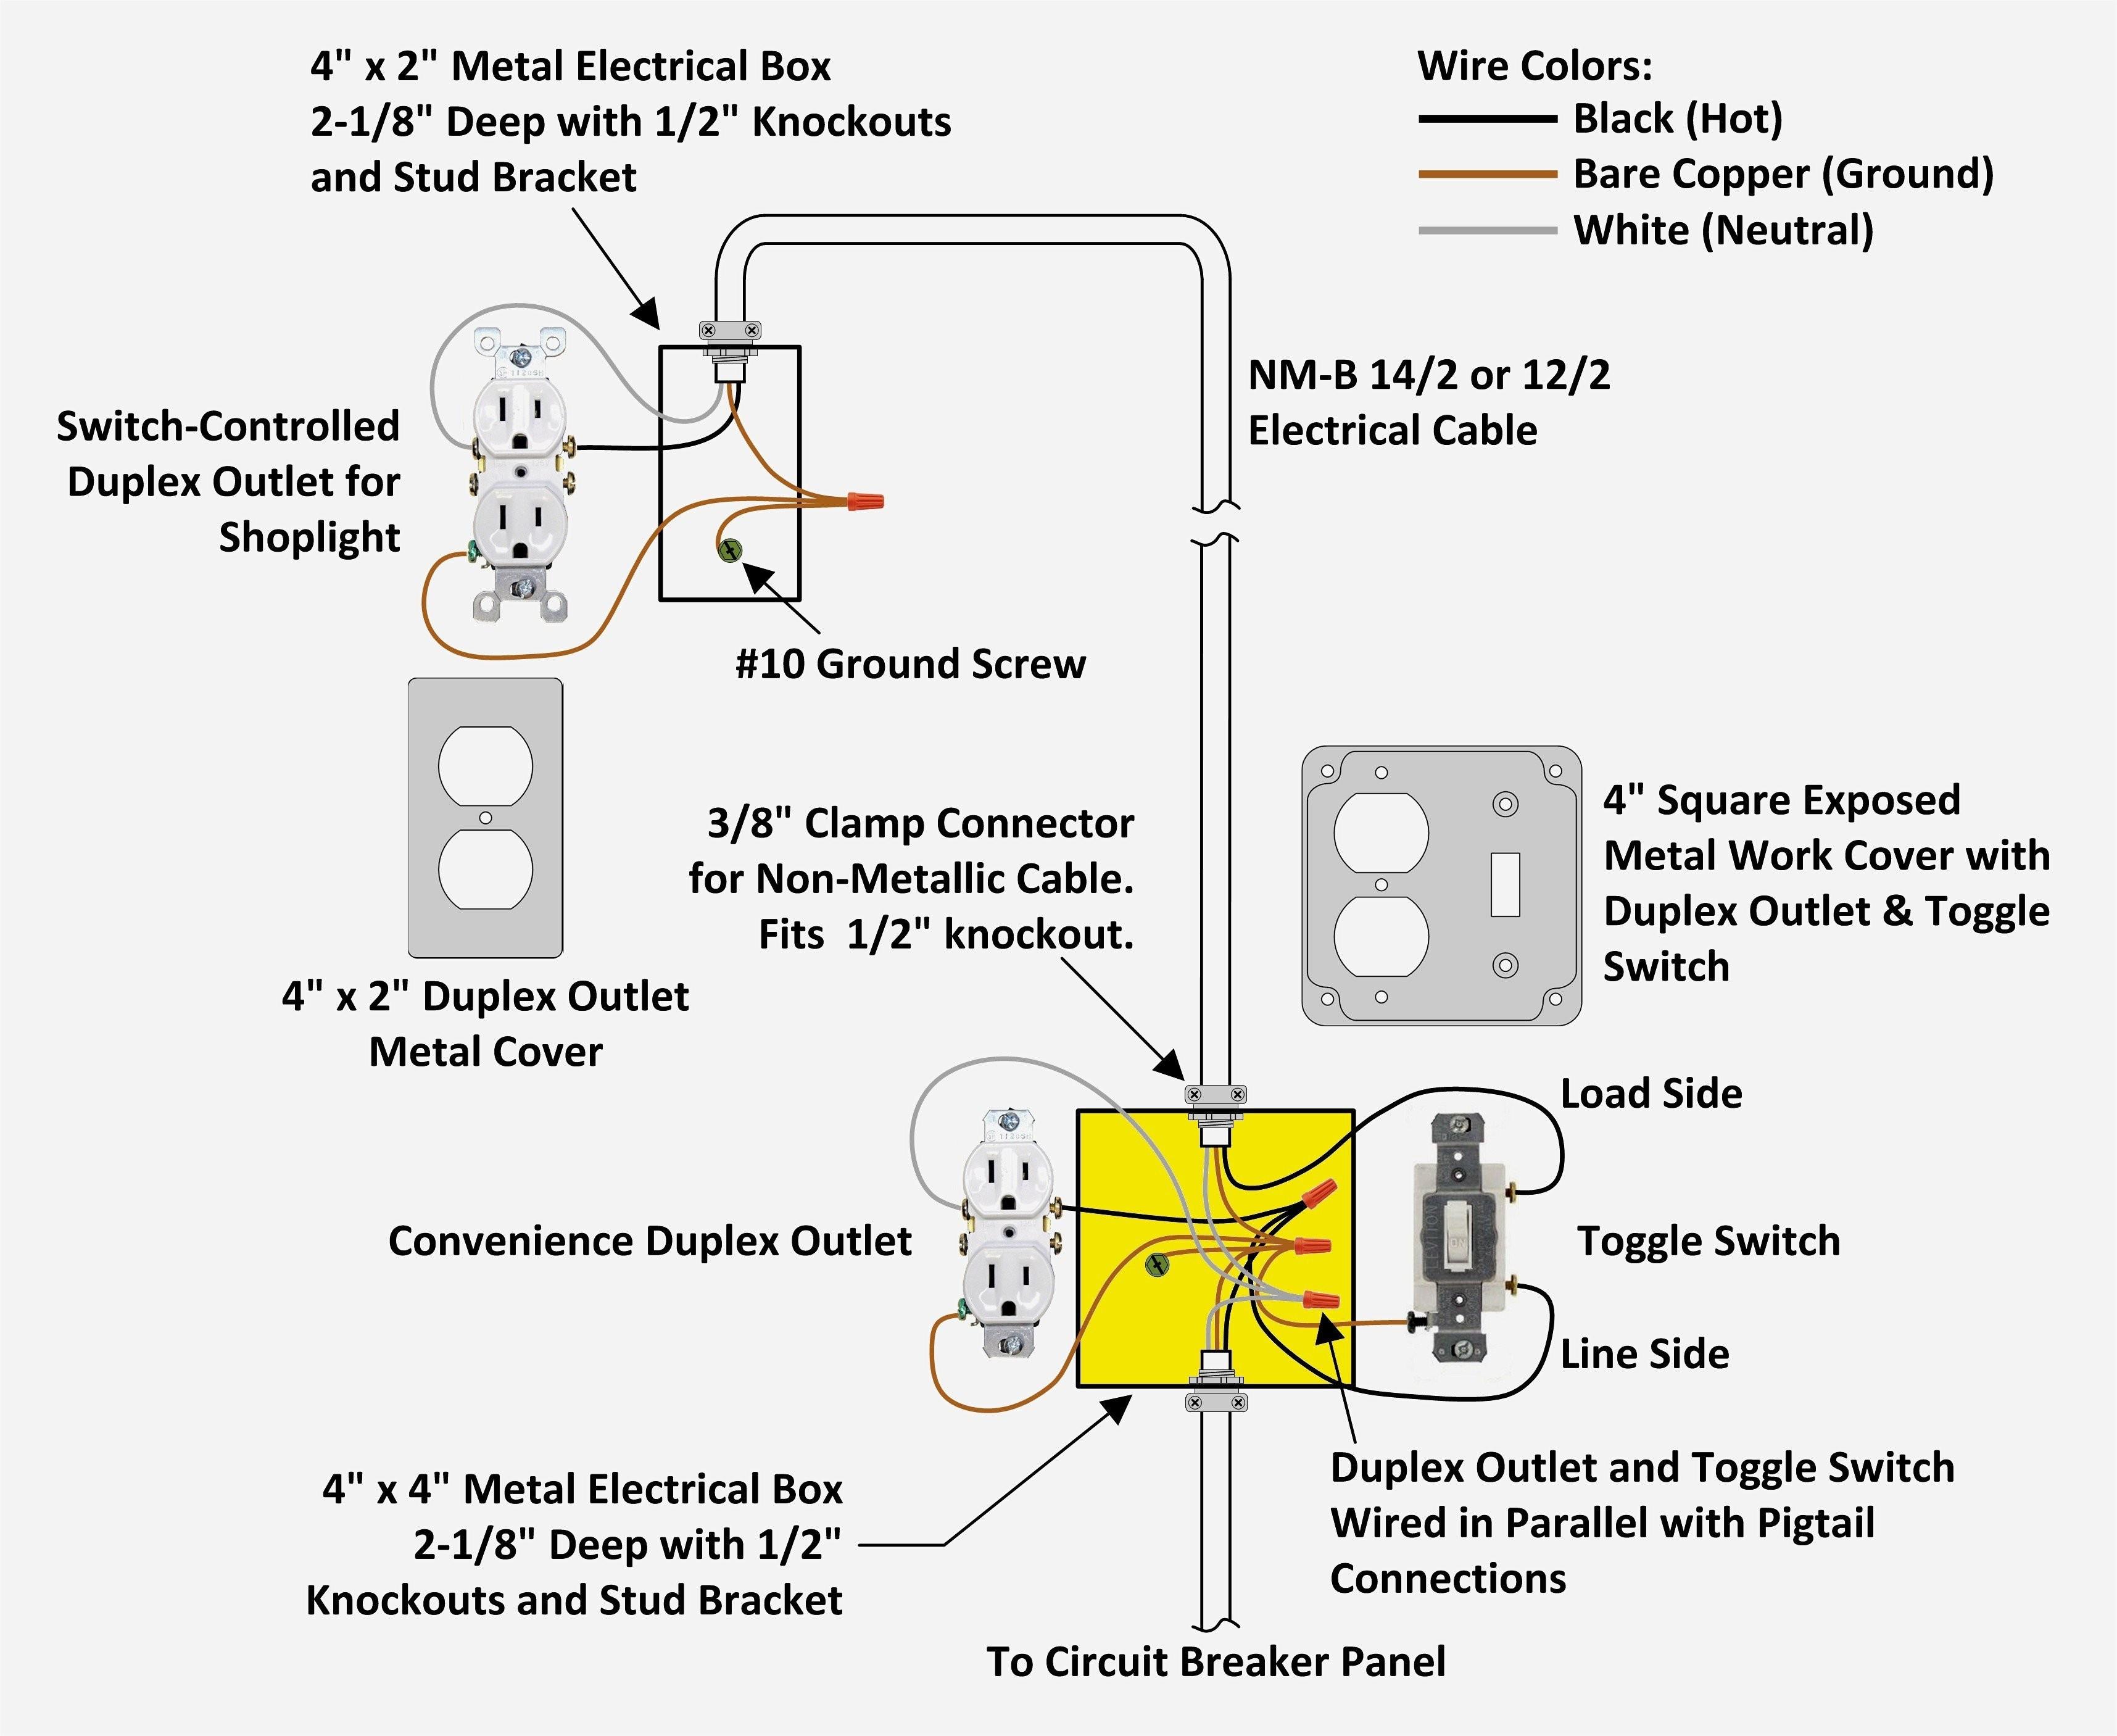 Leviton Phone Jack Wiring Diagram Recent Pilot Light Switch Wiring Diagram Lovely Wall Light Switches